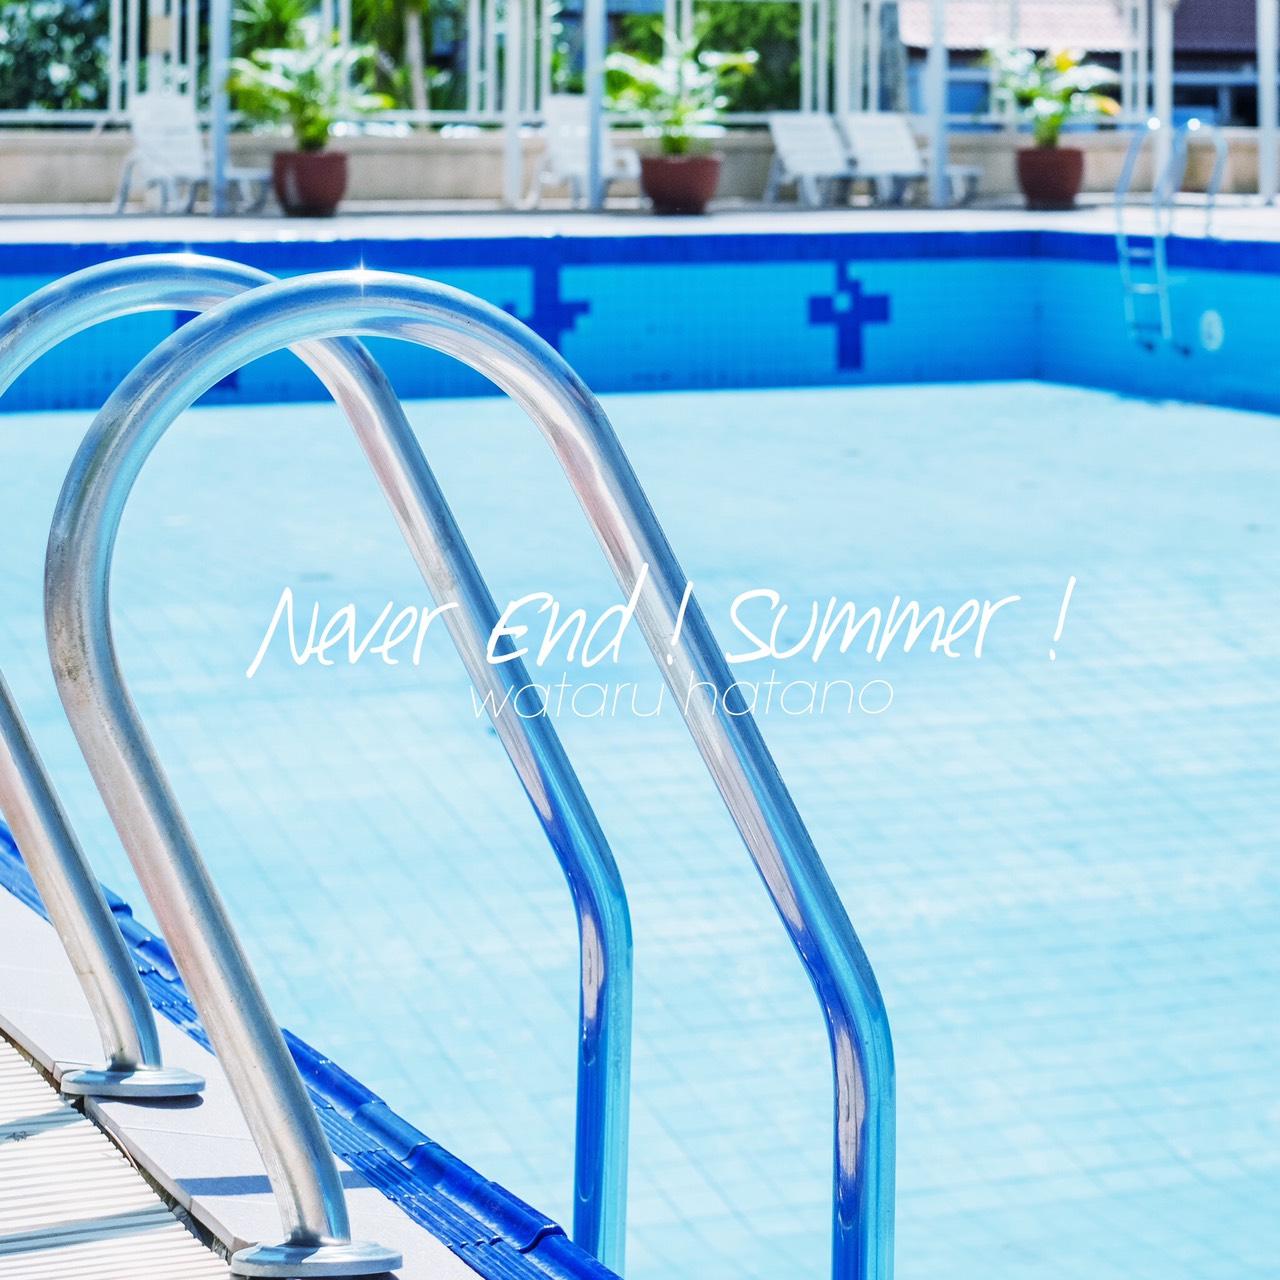 Wataru Hatano - Never End! Summer! mp3 rar